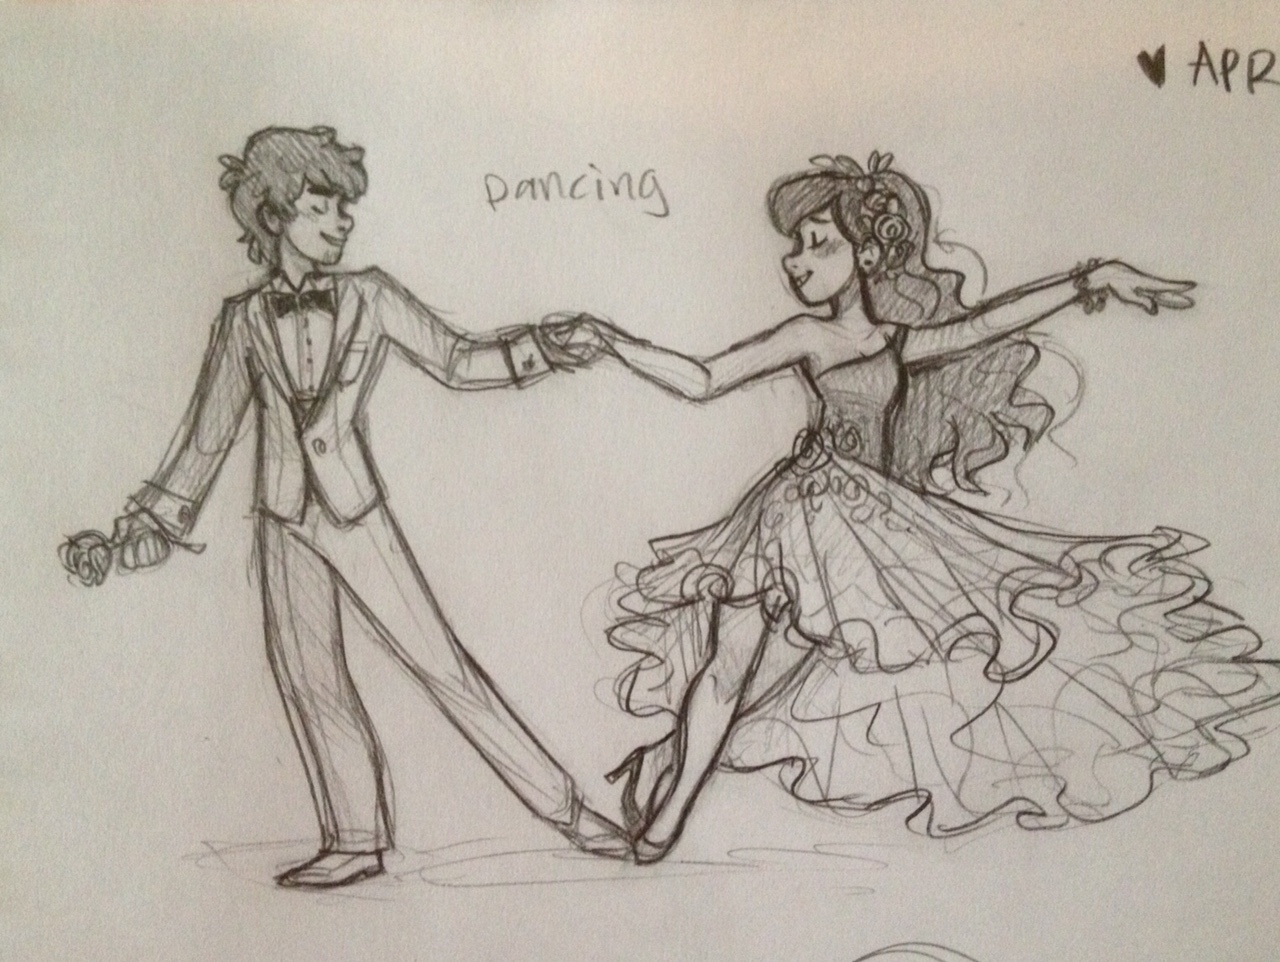 1280x962 Dancing Lt3 Via Tumblr On We Heart It